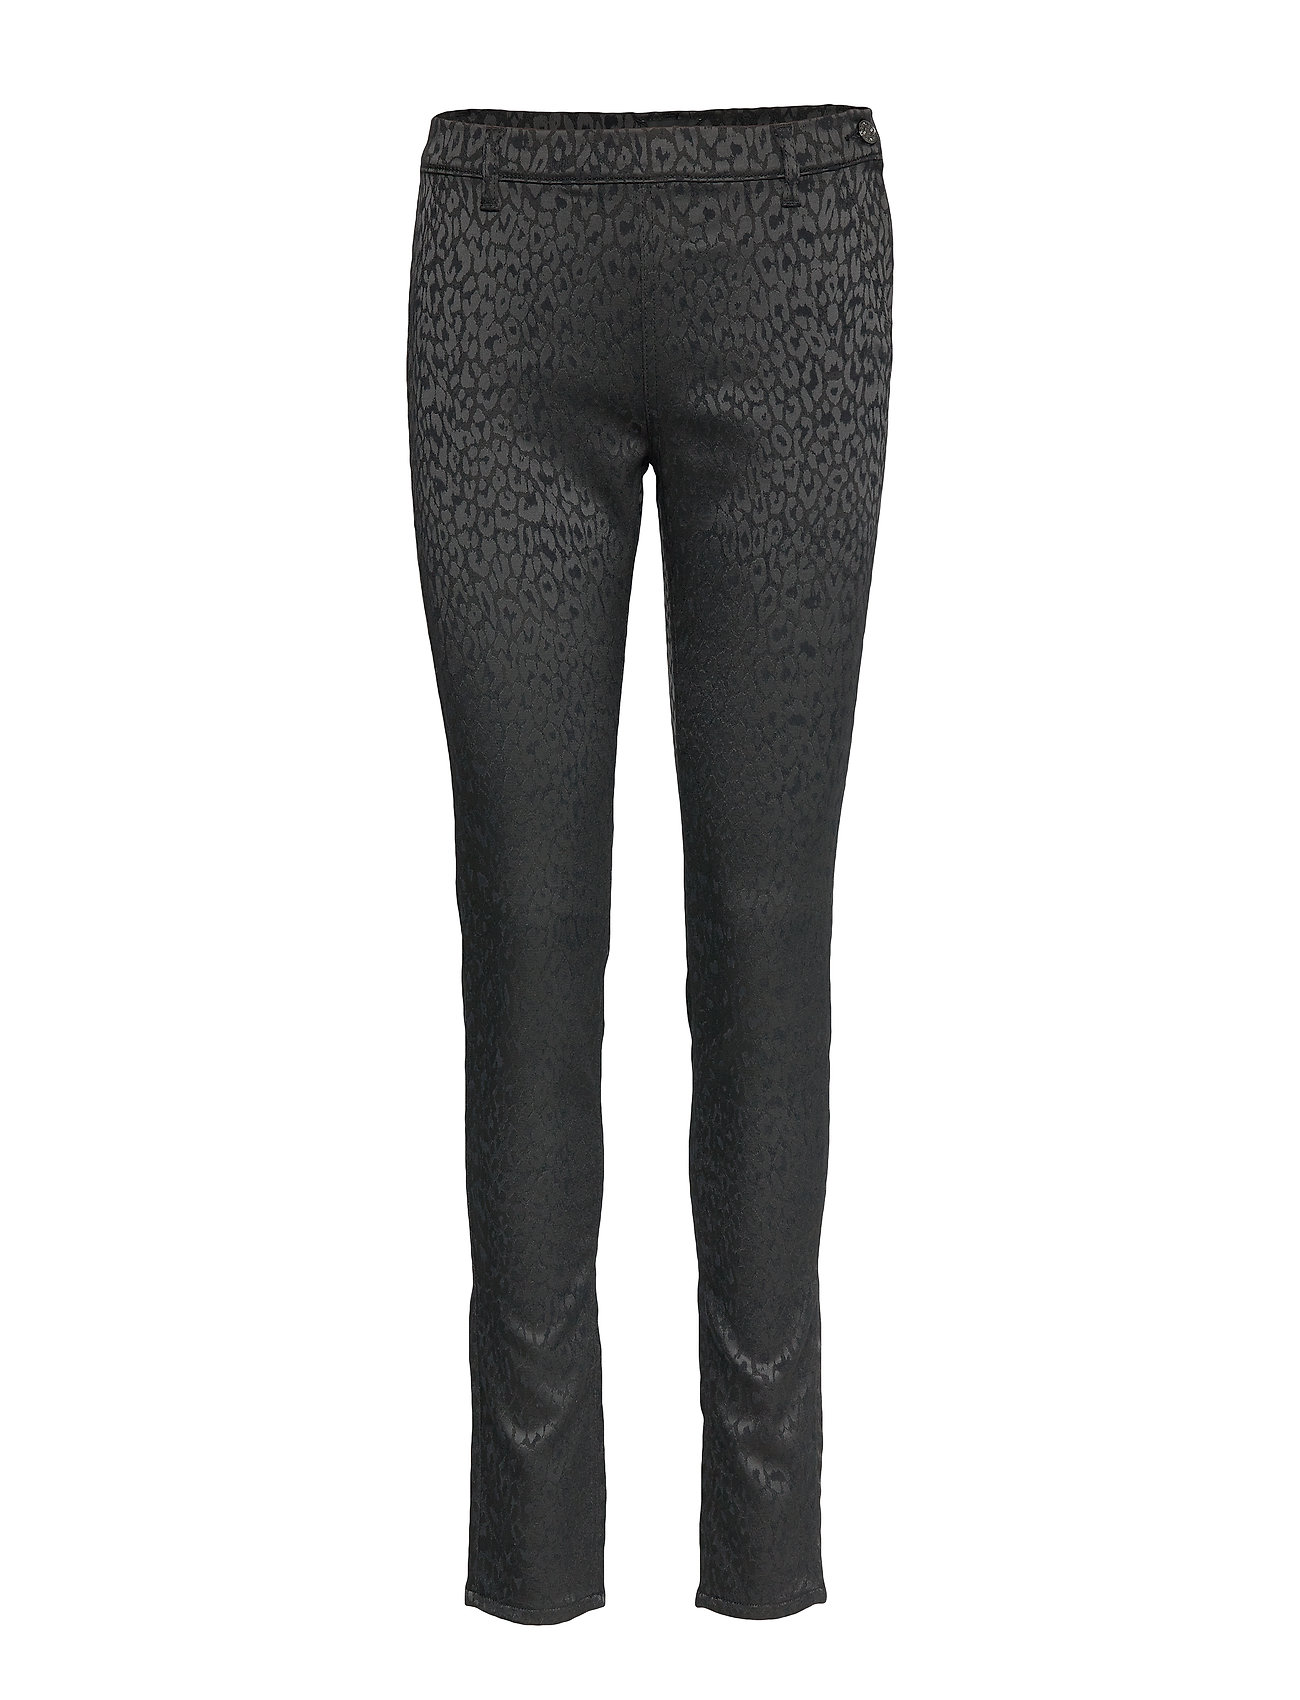 Image of 6125 - Maja Smalle Bukser Skinny Pants Sort SAND (3210822401)